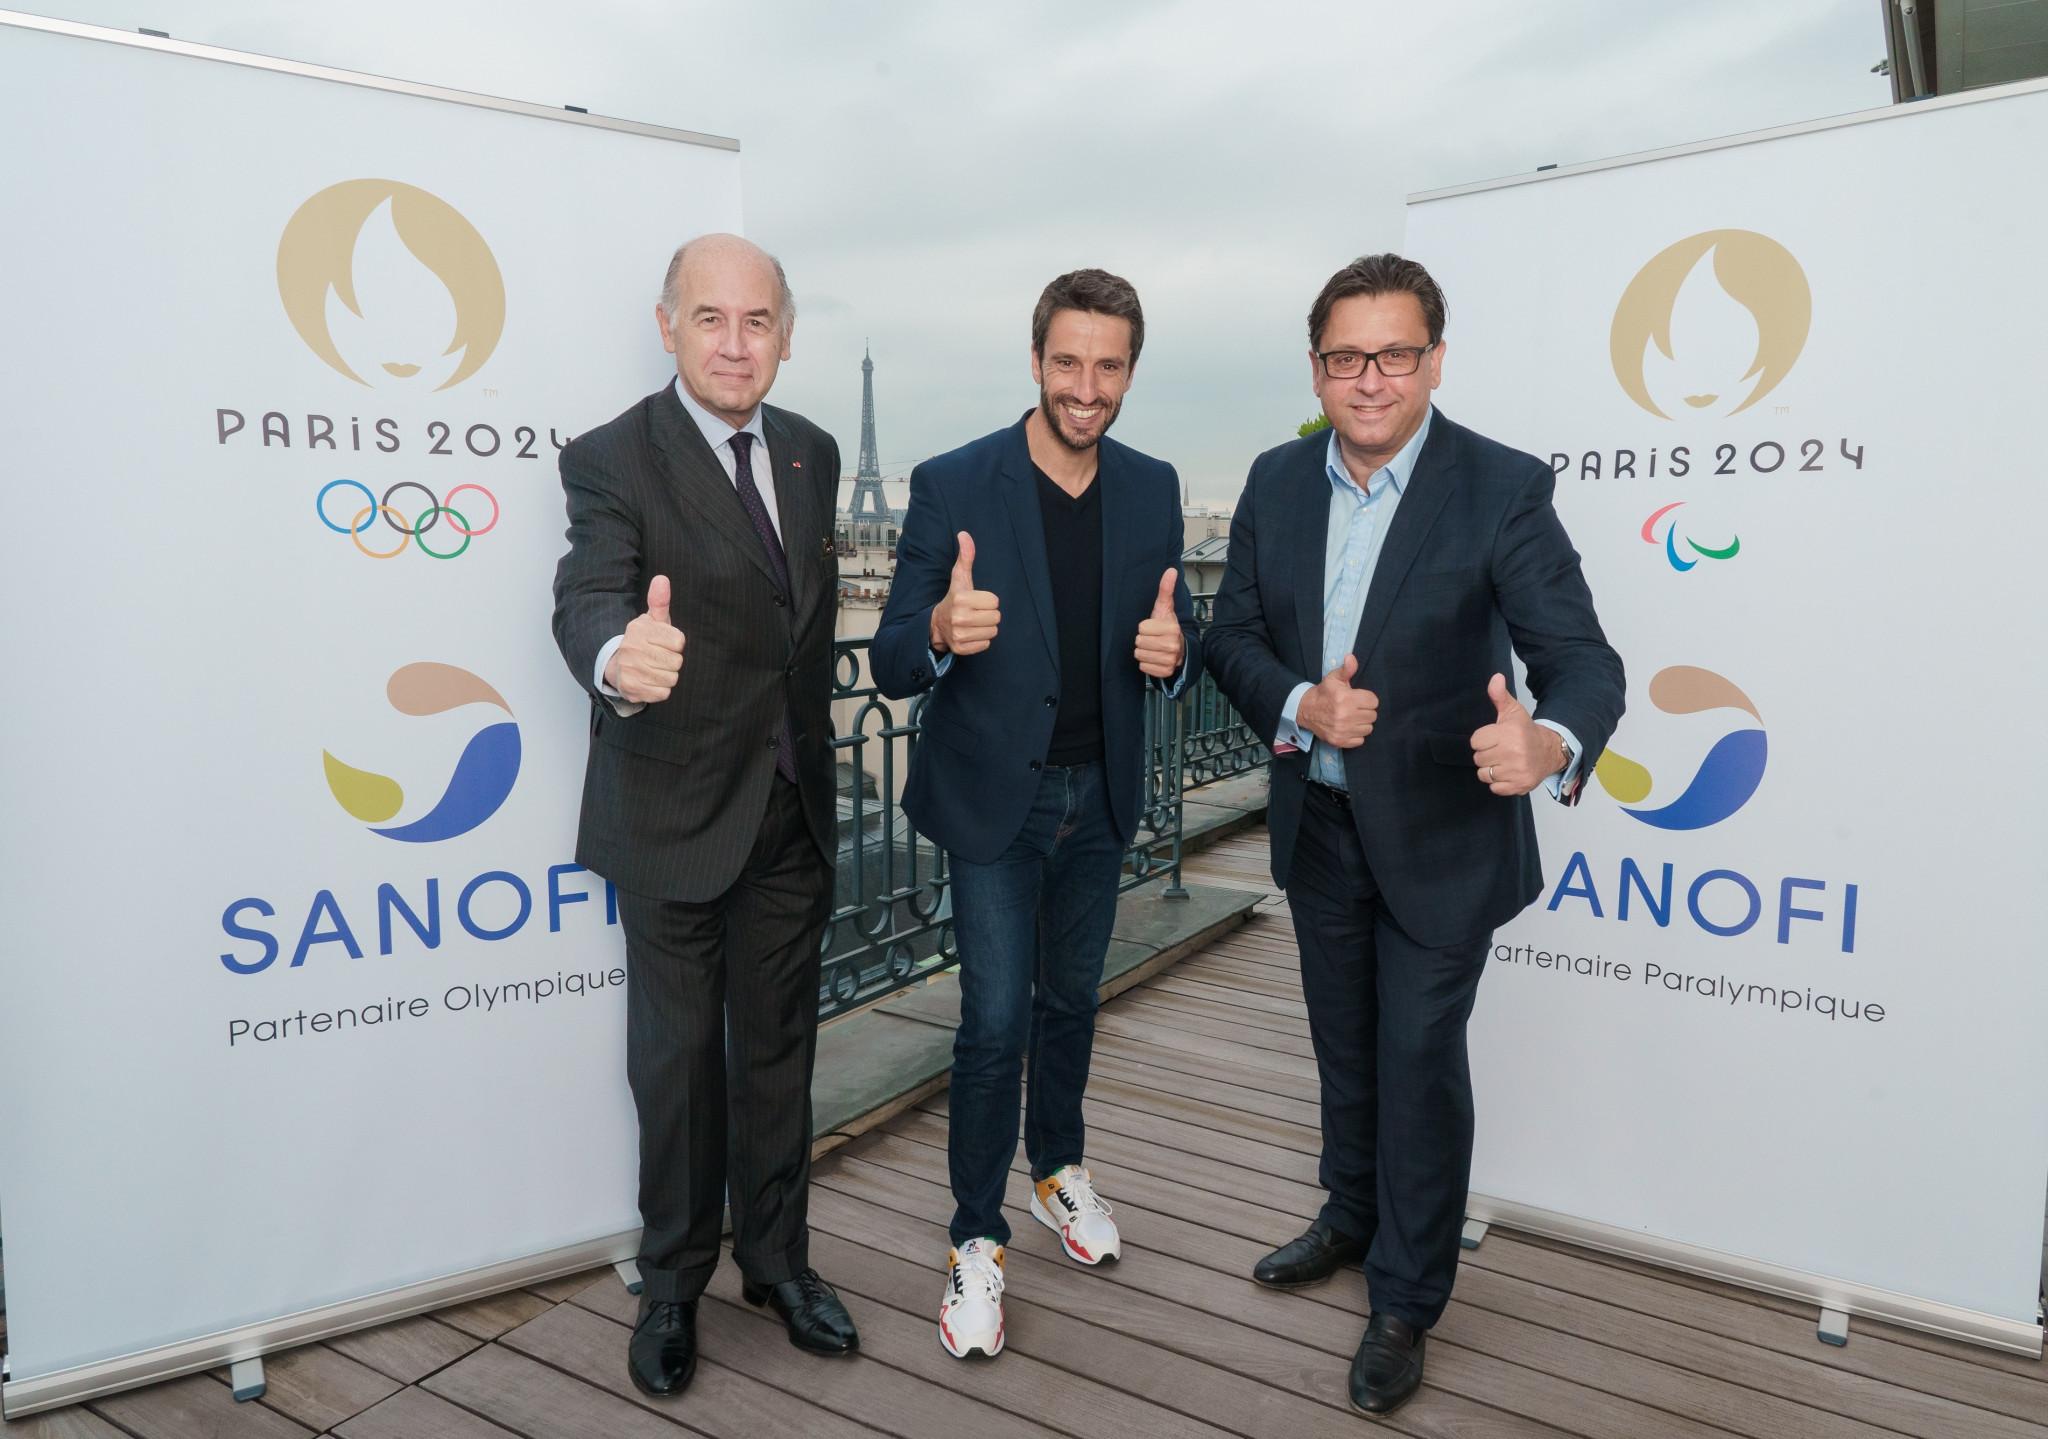 Paris 2024 President Tony Estanguet, centre, welcomed Sanofi to the highest level of the Organising Committee's sponsorship scheme ©Paris 2024